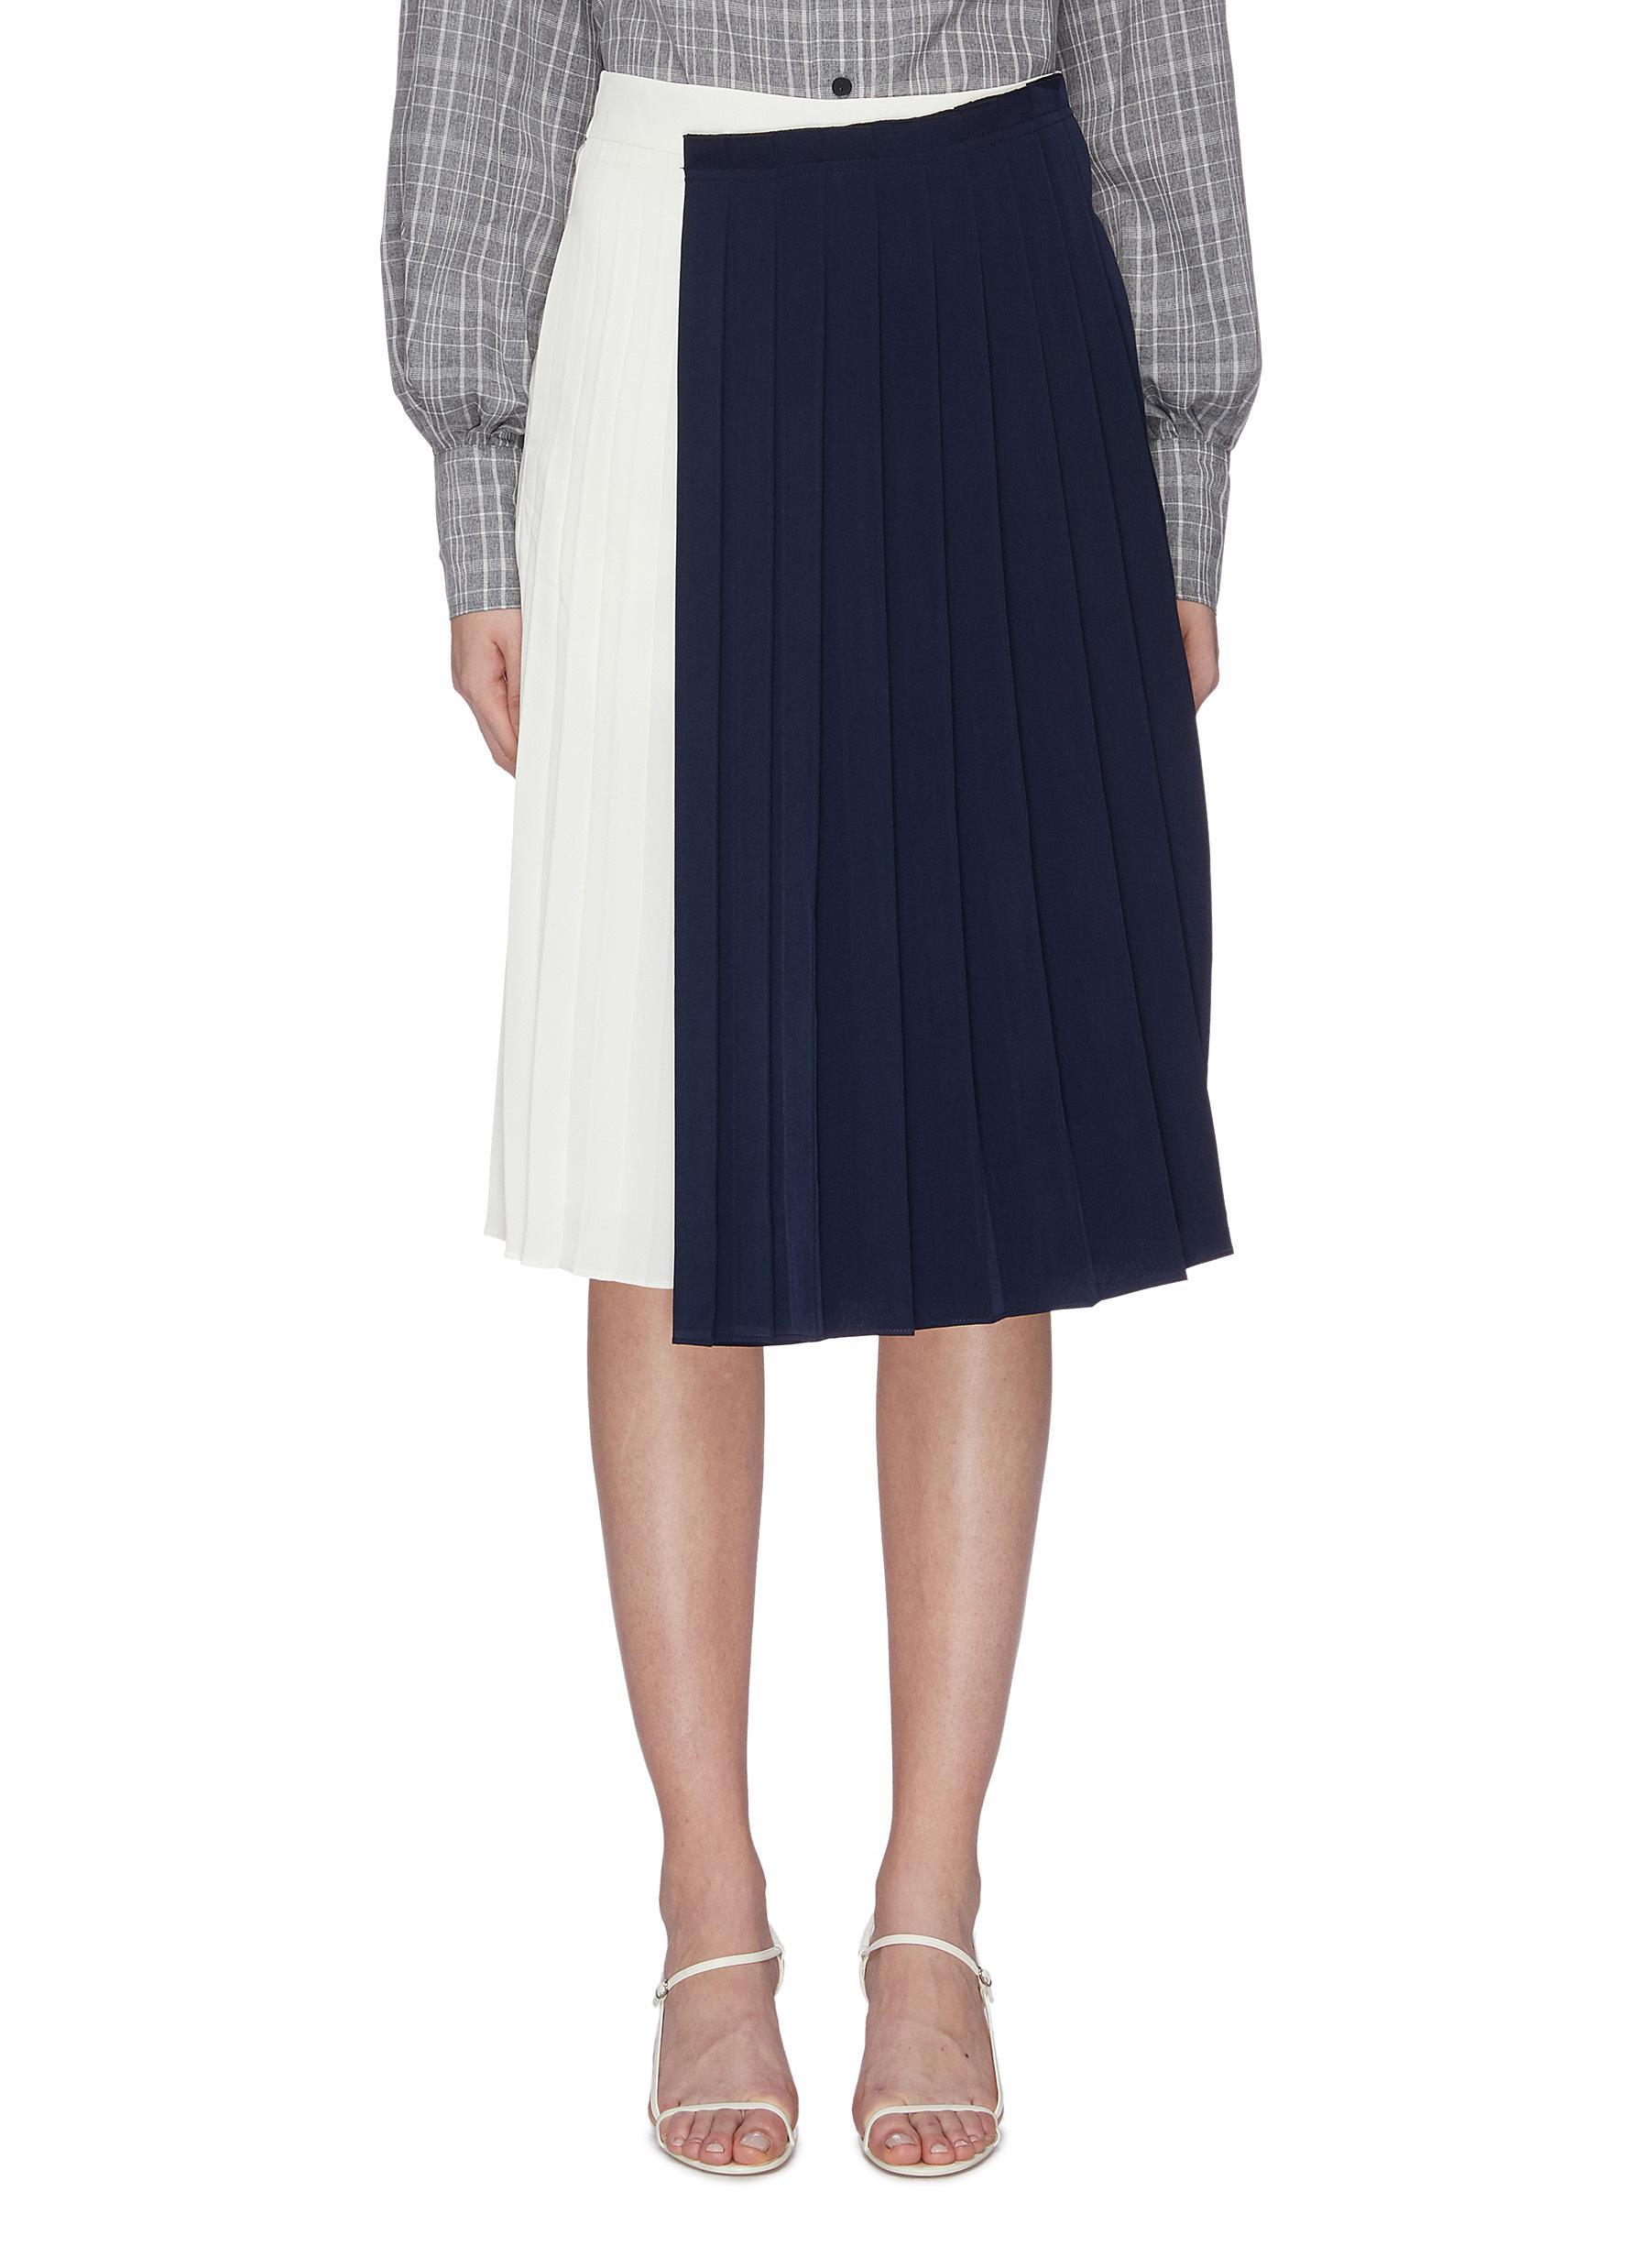 Colourblock pleated skirt by Mijeong Park